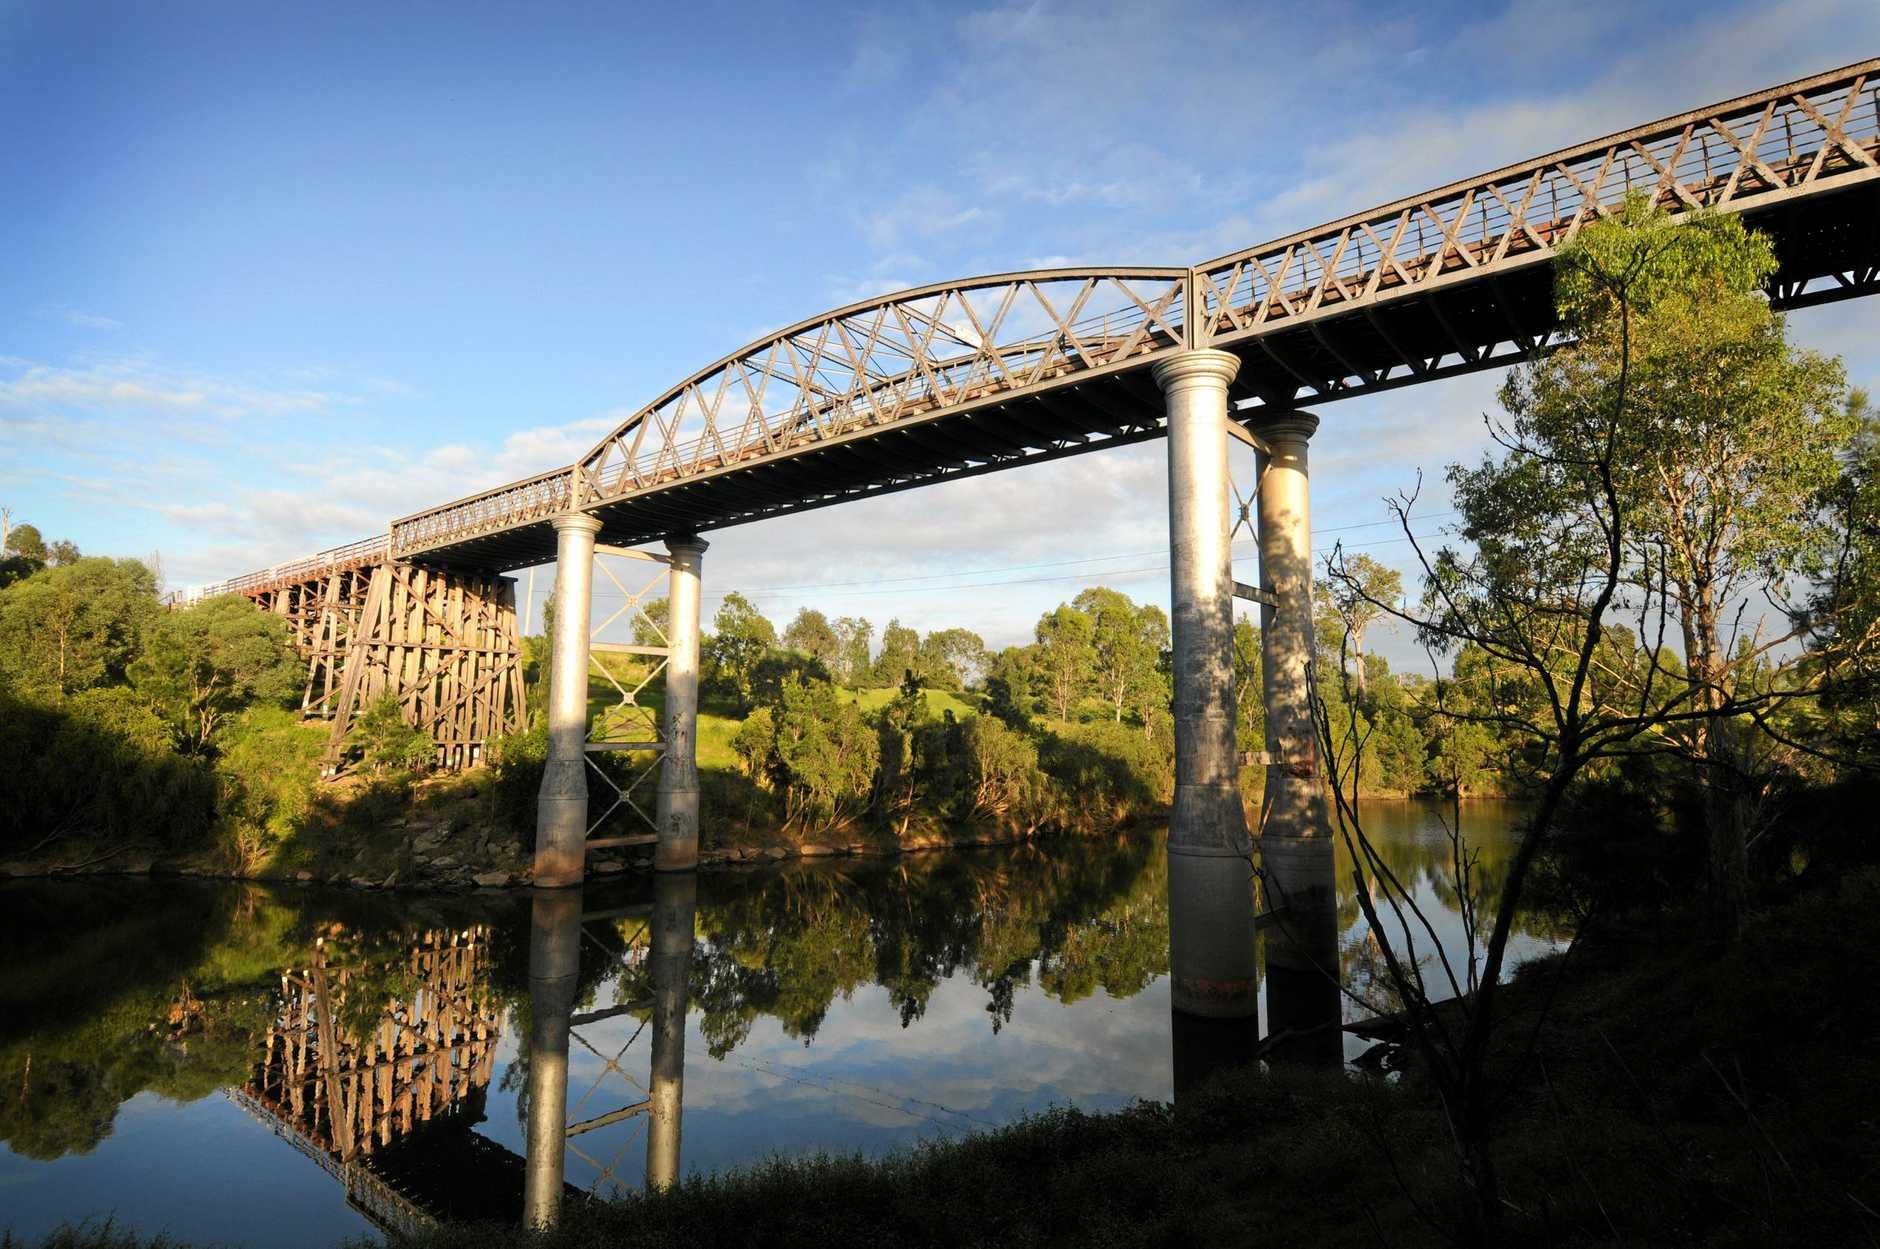 Miva is the home of the historic Dickabram bridge